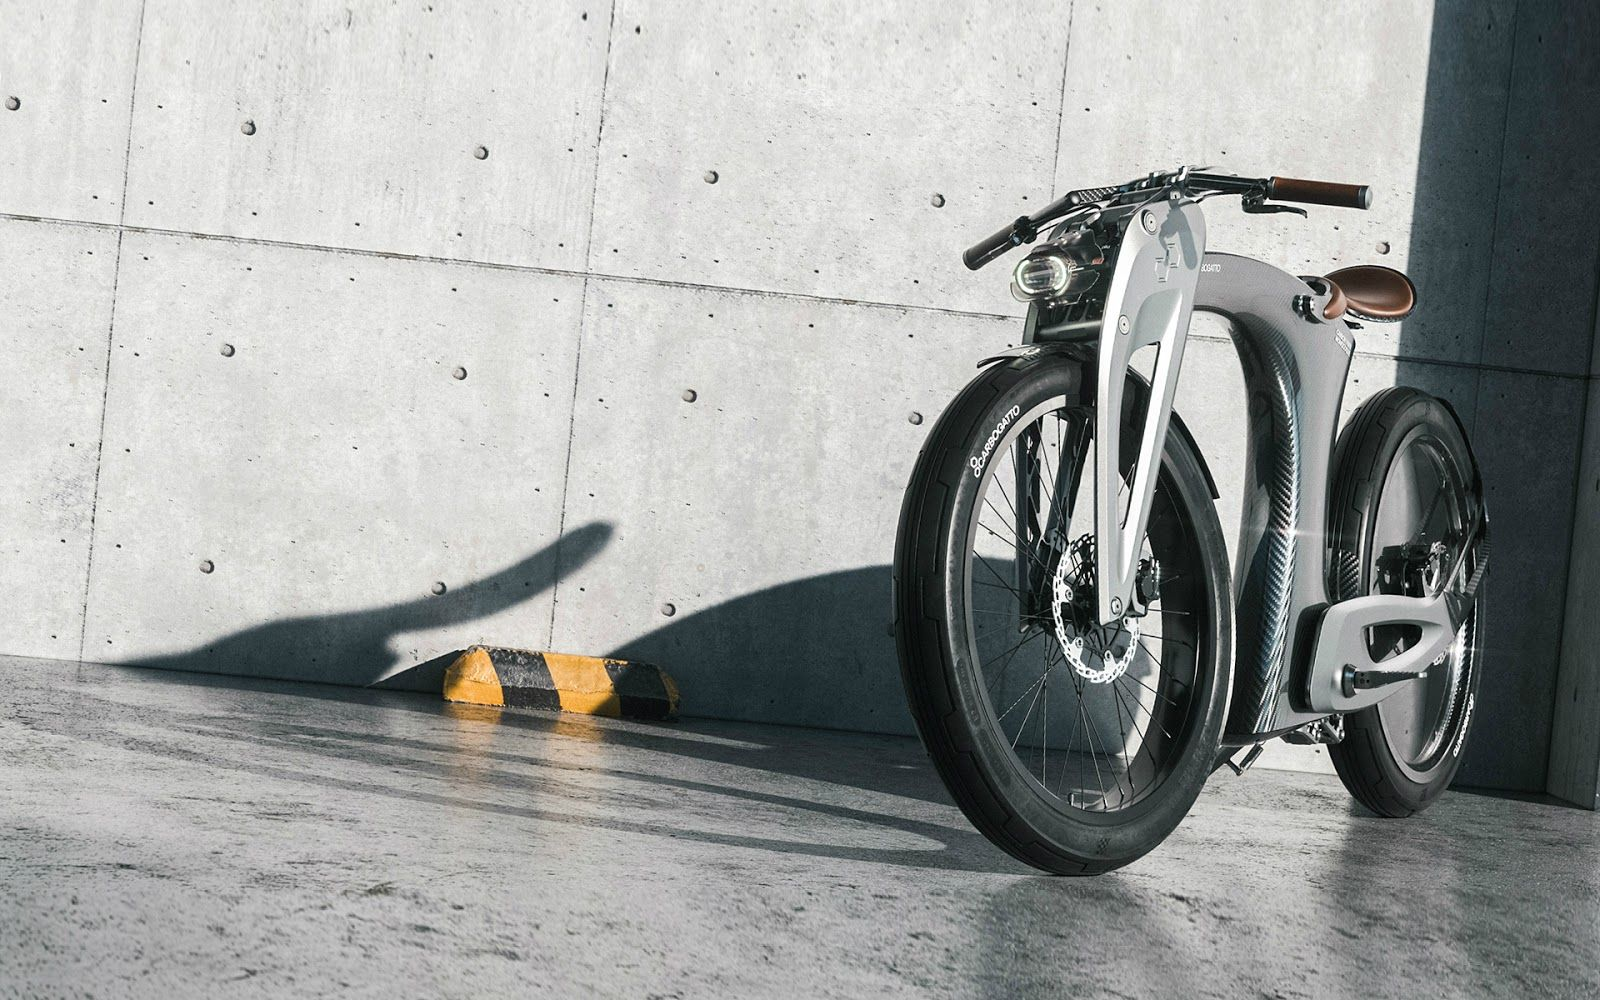 Carbogatto In 2020 Electric Motorbike Motorbike Design Automotive Design